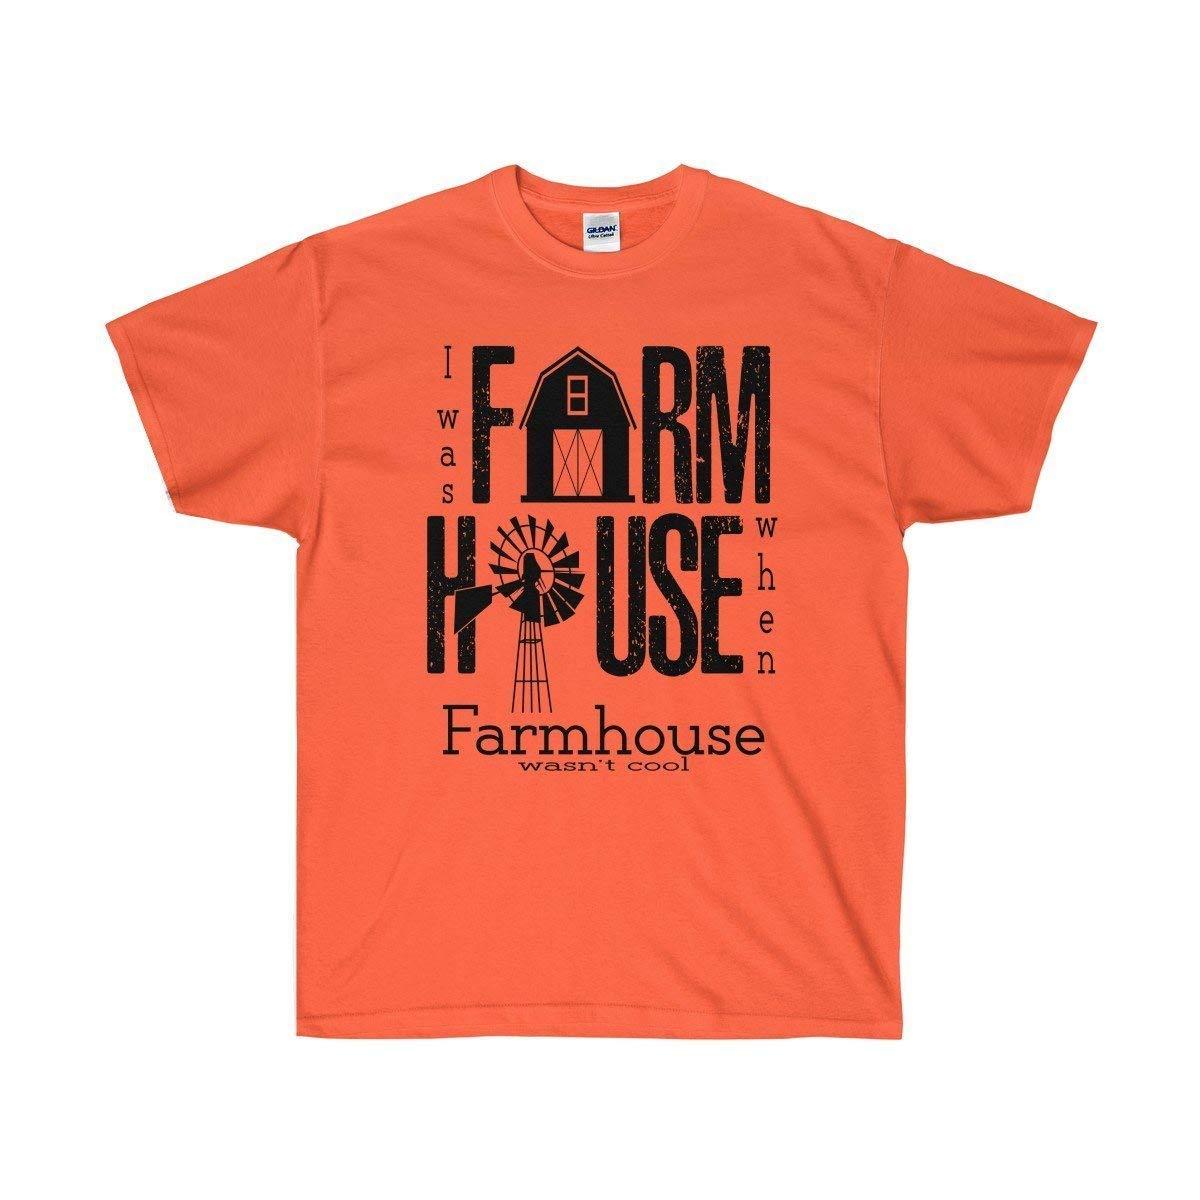 TXRepublic Farmhouse Unisex Ultra Cotton Tee Orange